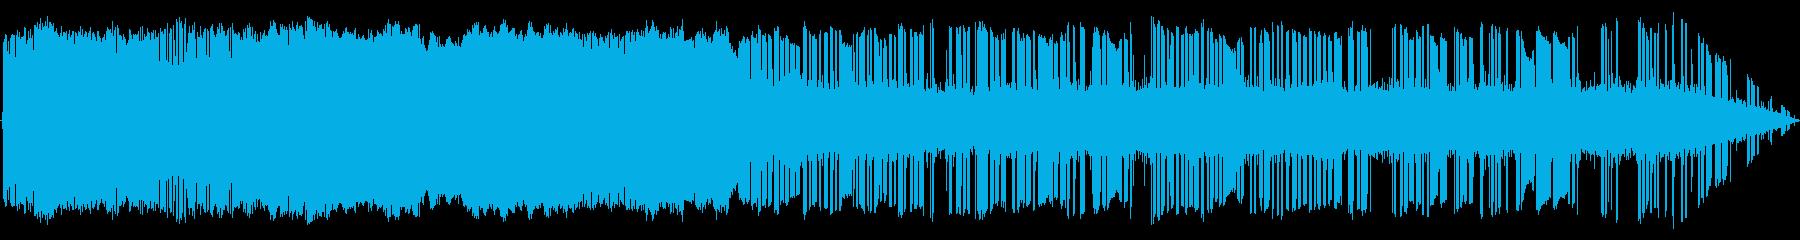 Interface Noiseの再生済みの波形